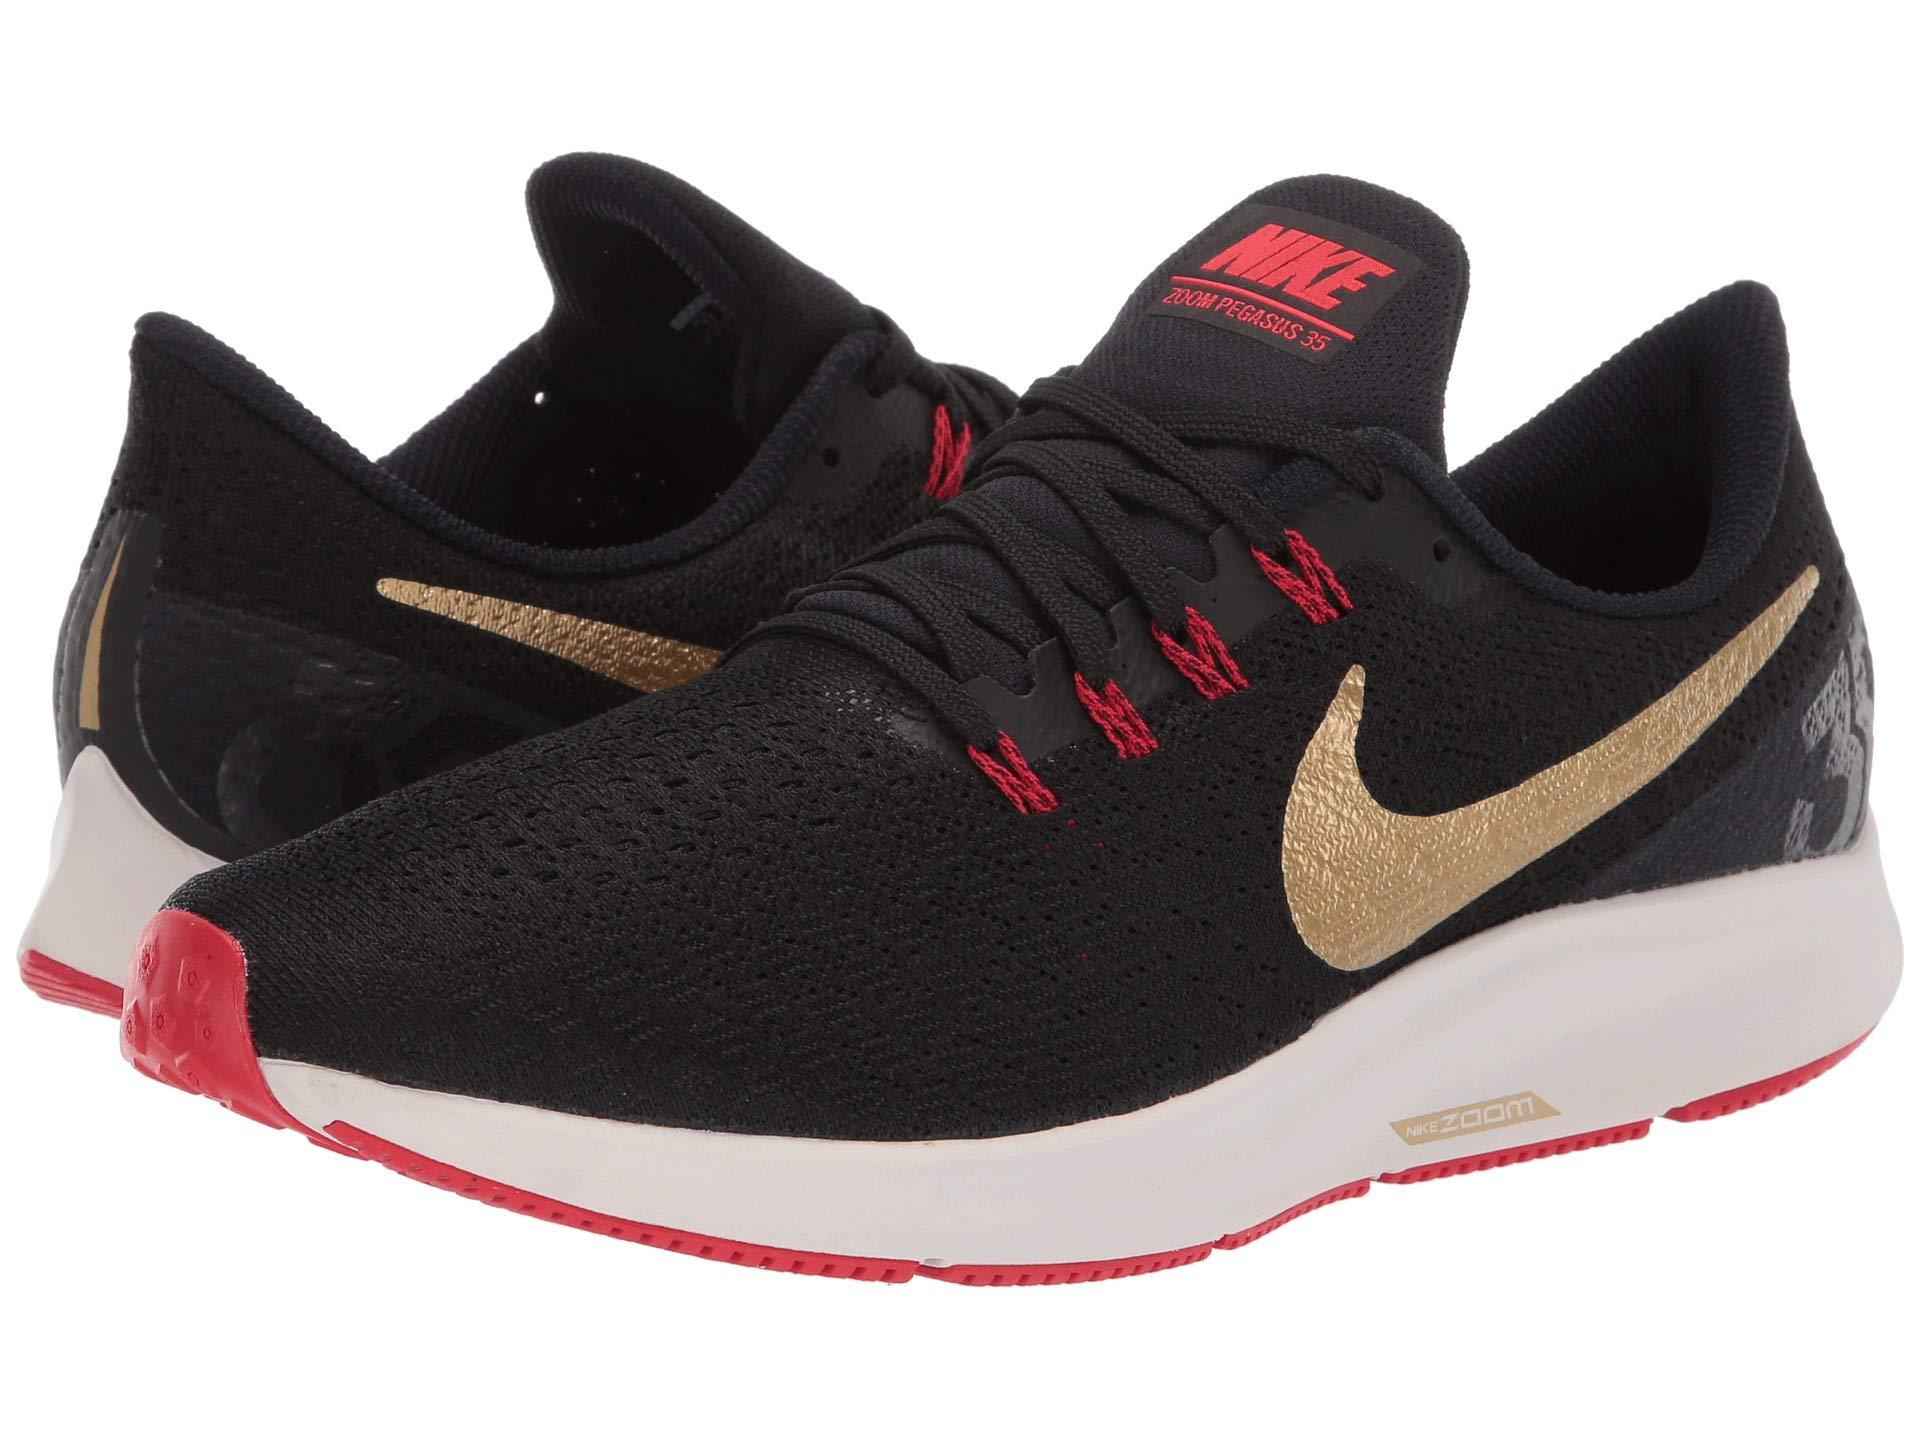 ab480a29075d6 Nike - Metallic Air Zoom Pegasus 35 (light Silver dark Stucco twilight  Marsh. View fullscreen